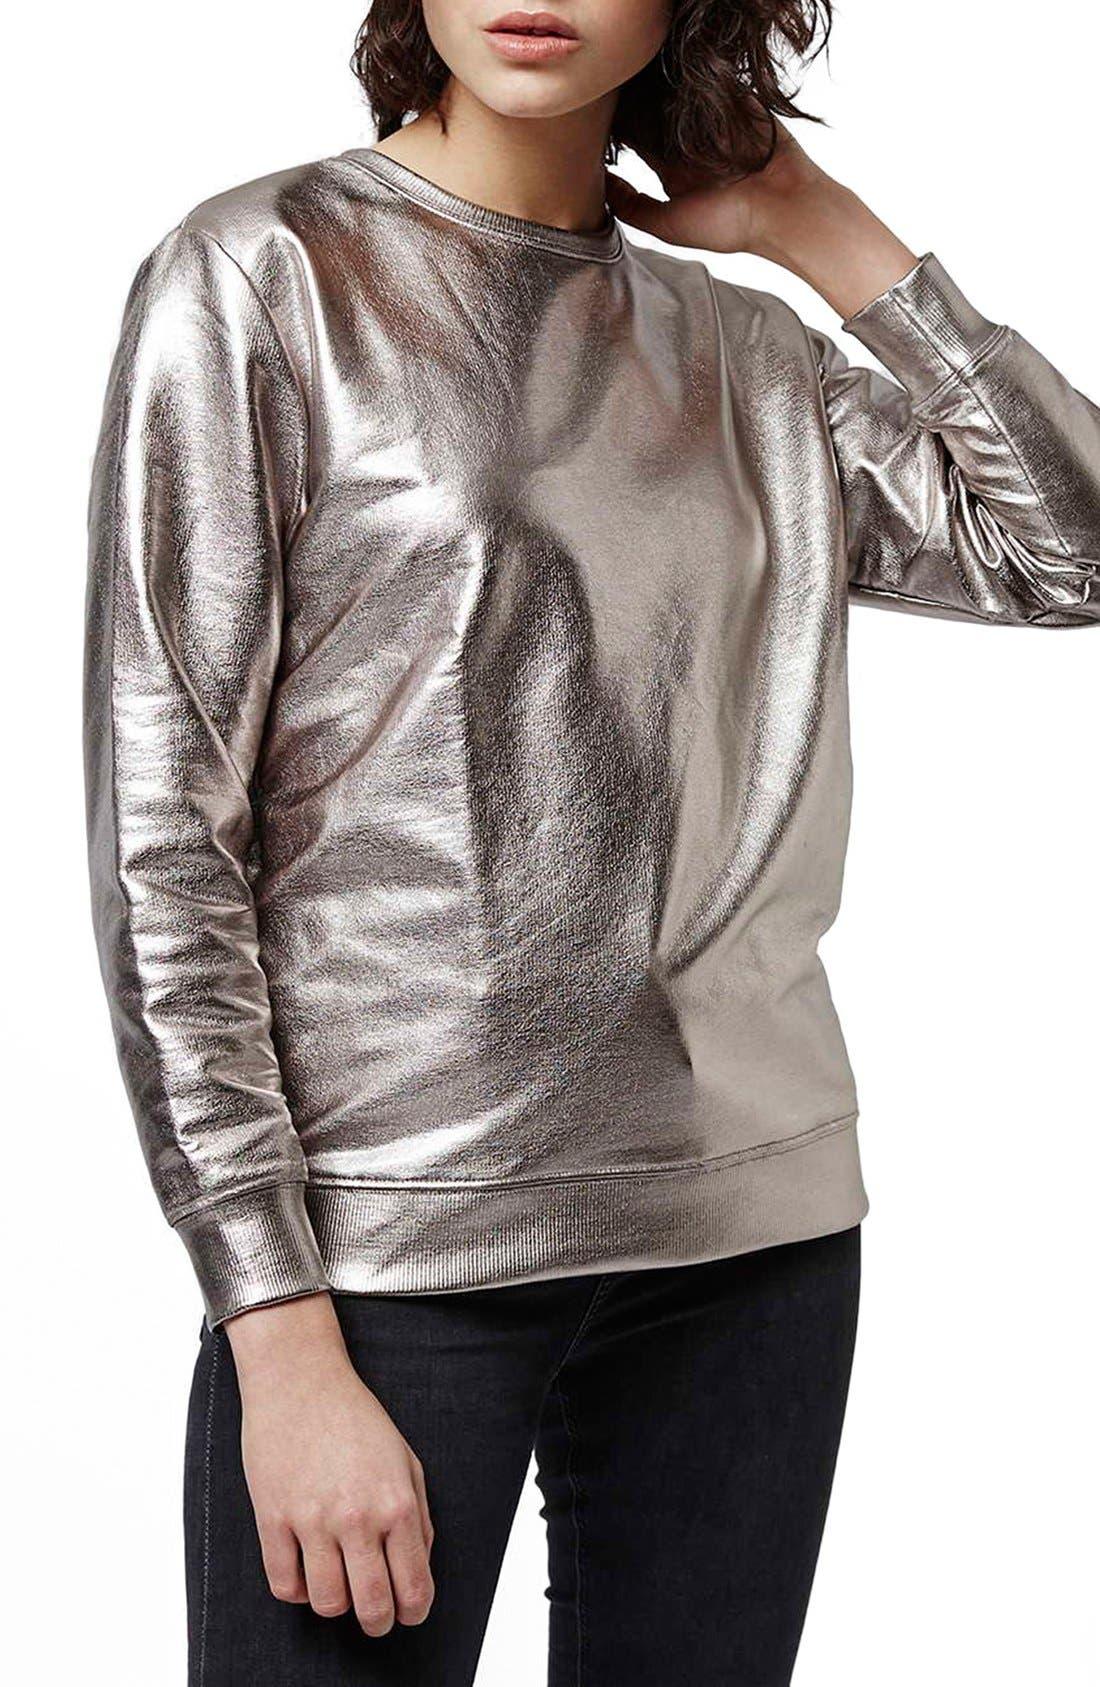 Alternate Image 1 Selected - Topshop 'Luxe' Foiled Sweatshirt